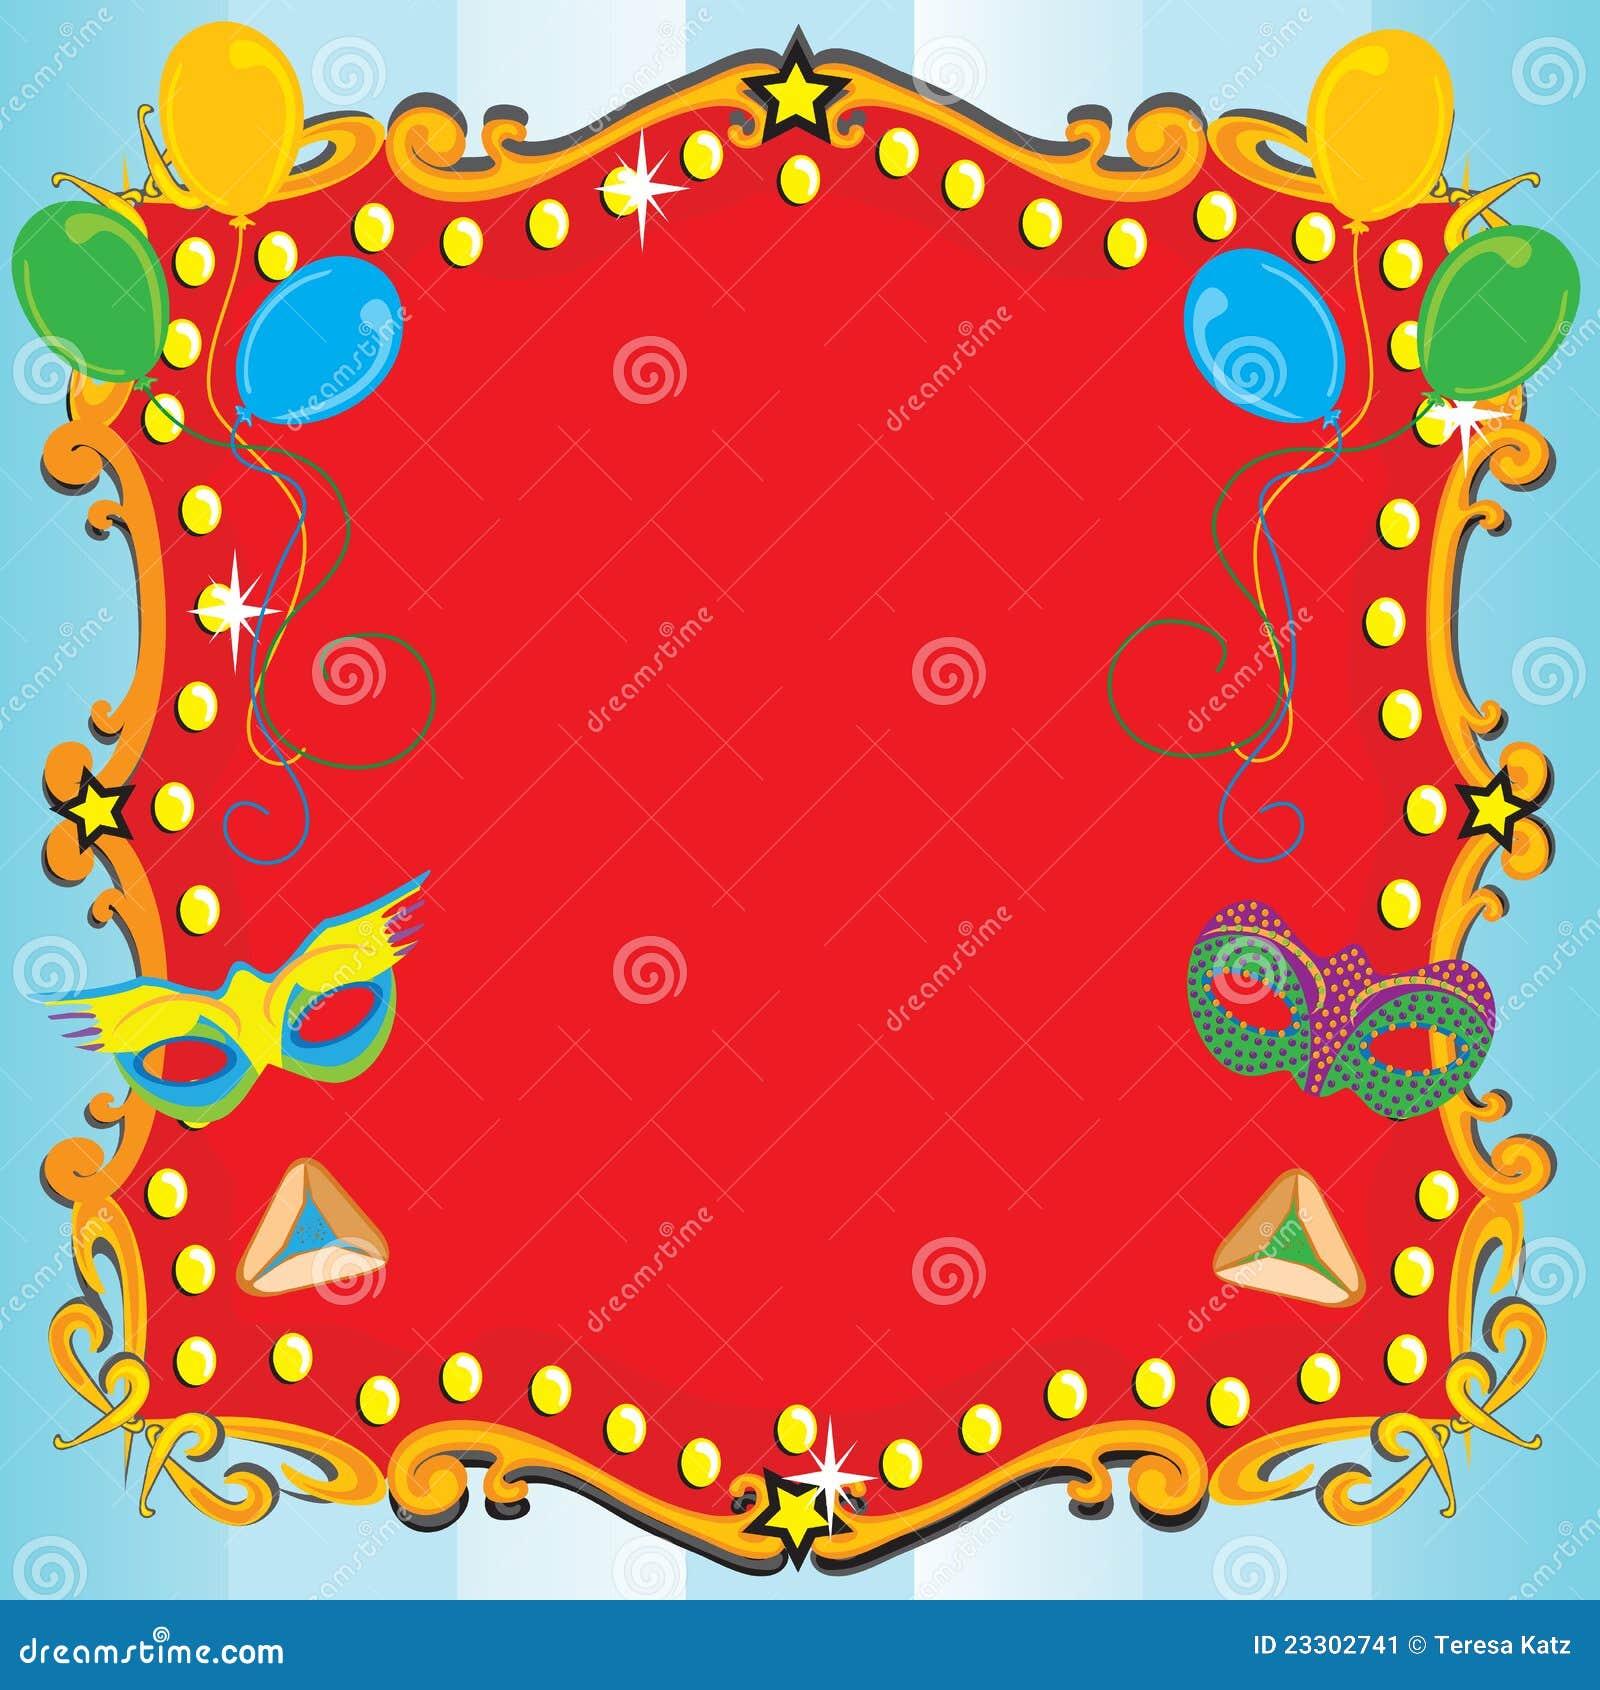 Carnival Theme Invitation with adorable invitations ideas